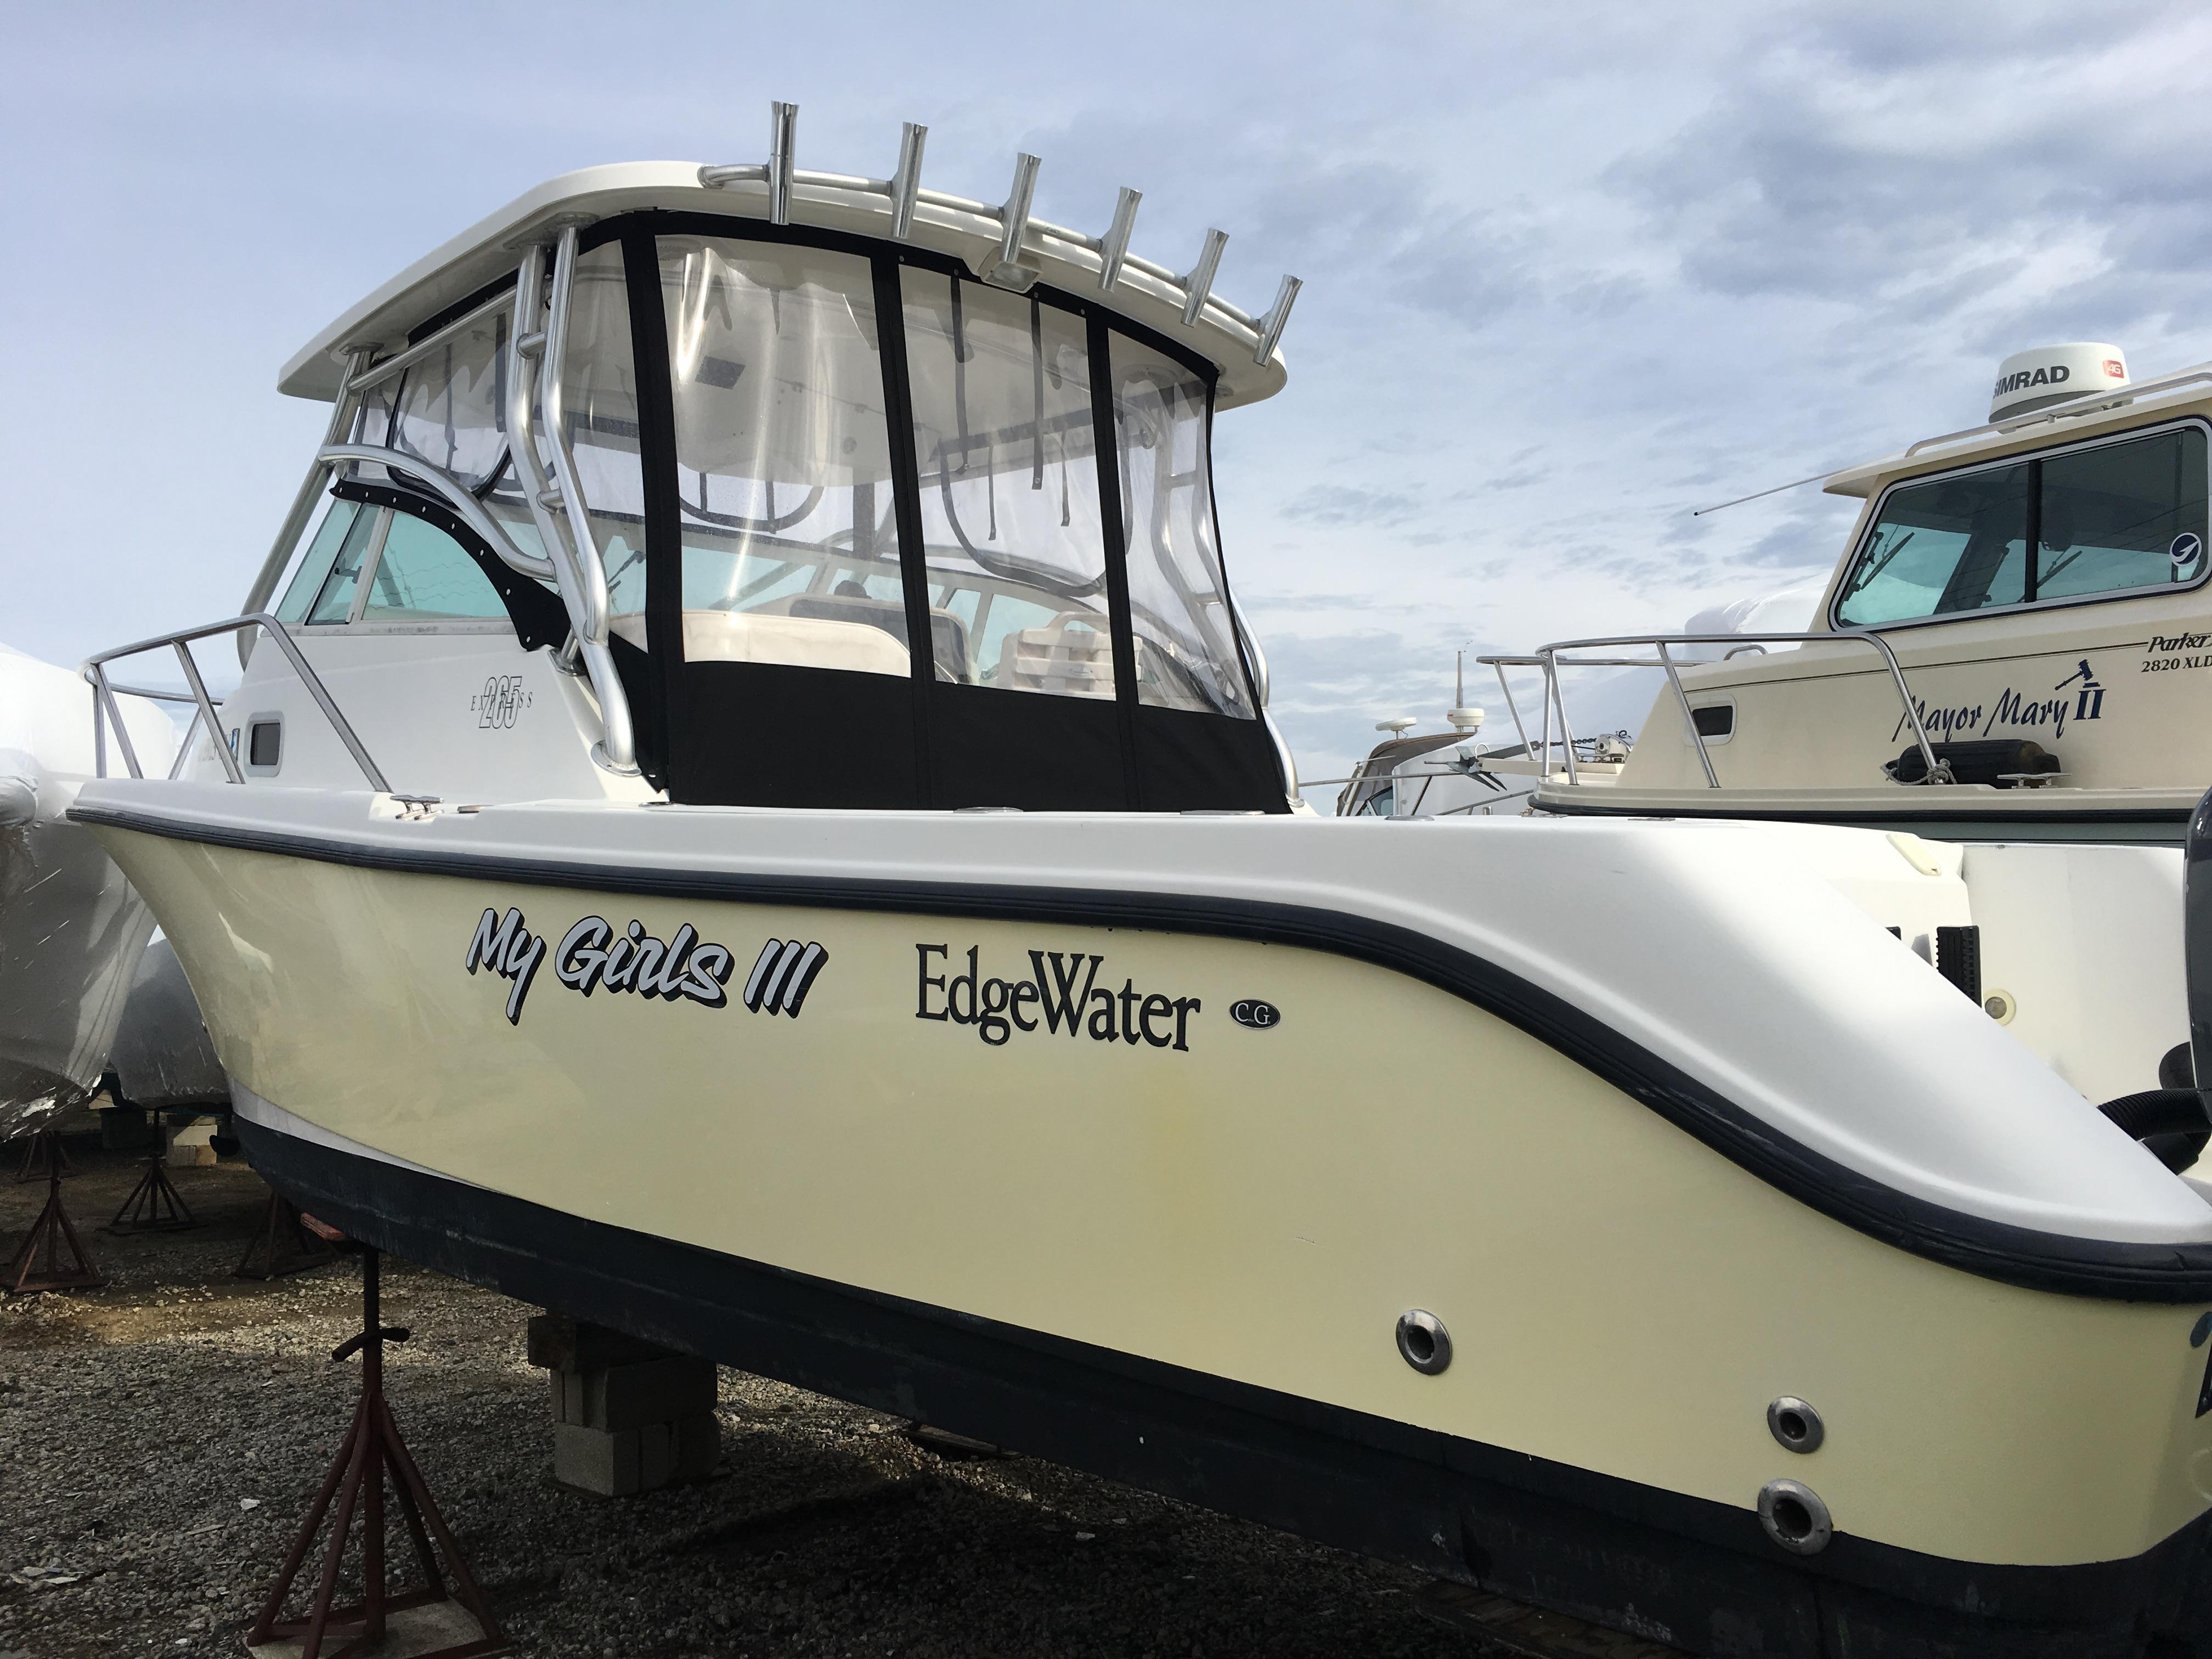 2005 Edgewater 265 Hardtop Express Sandy Hook Yacht Sales